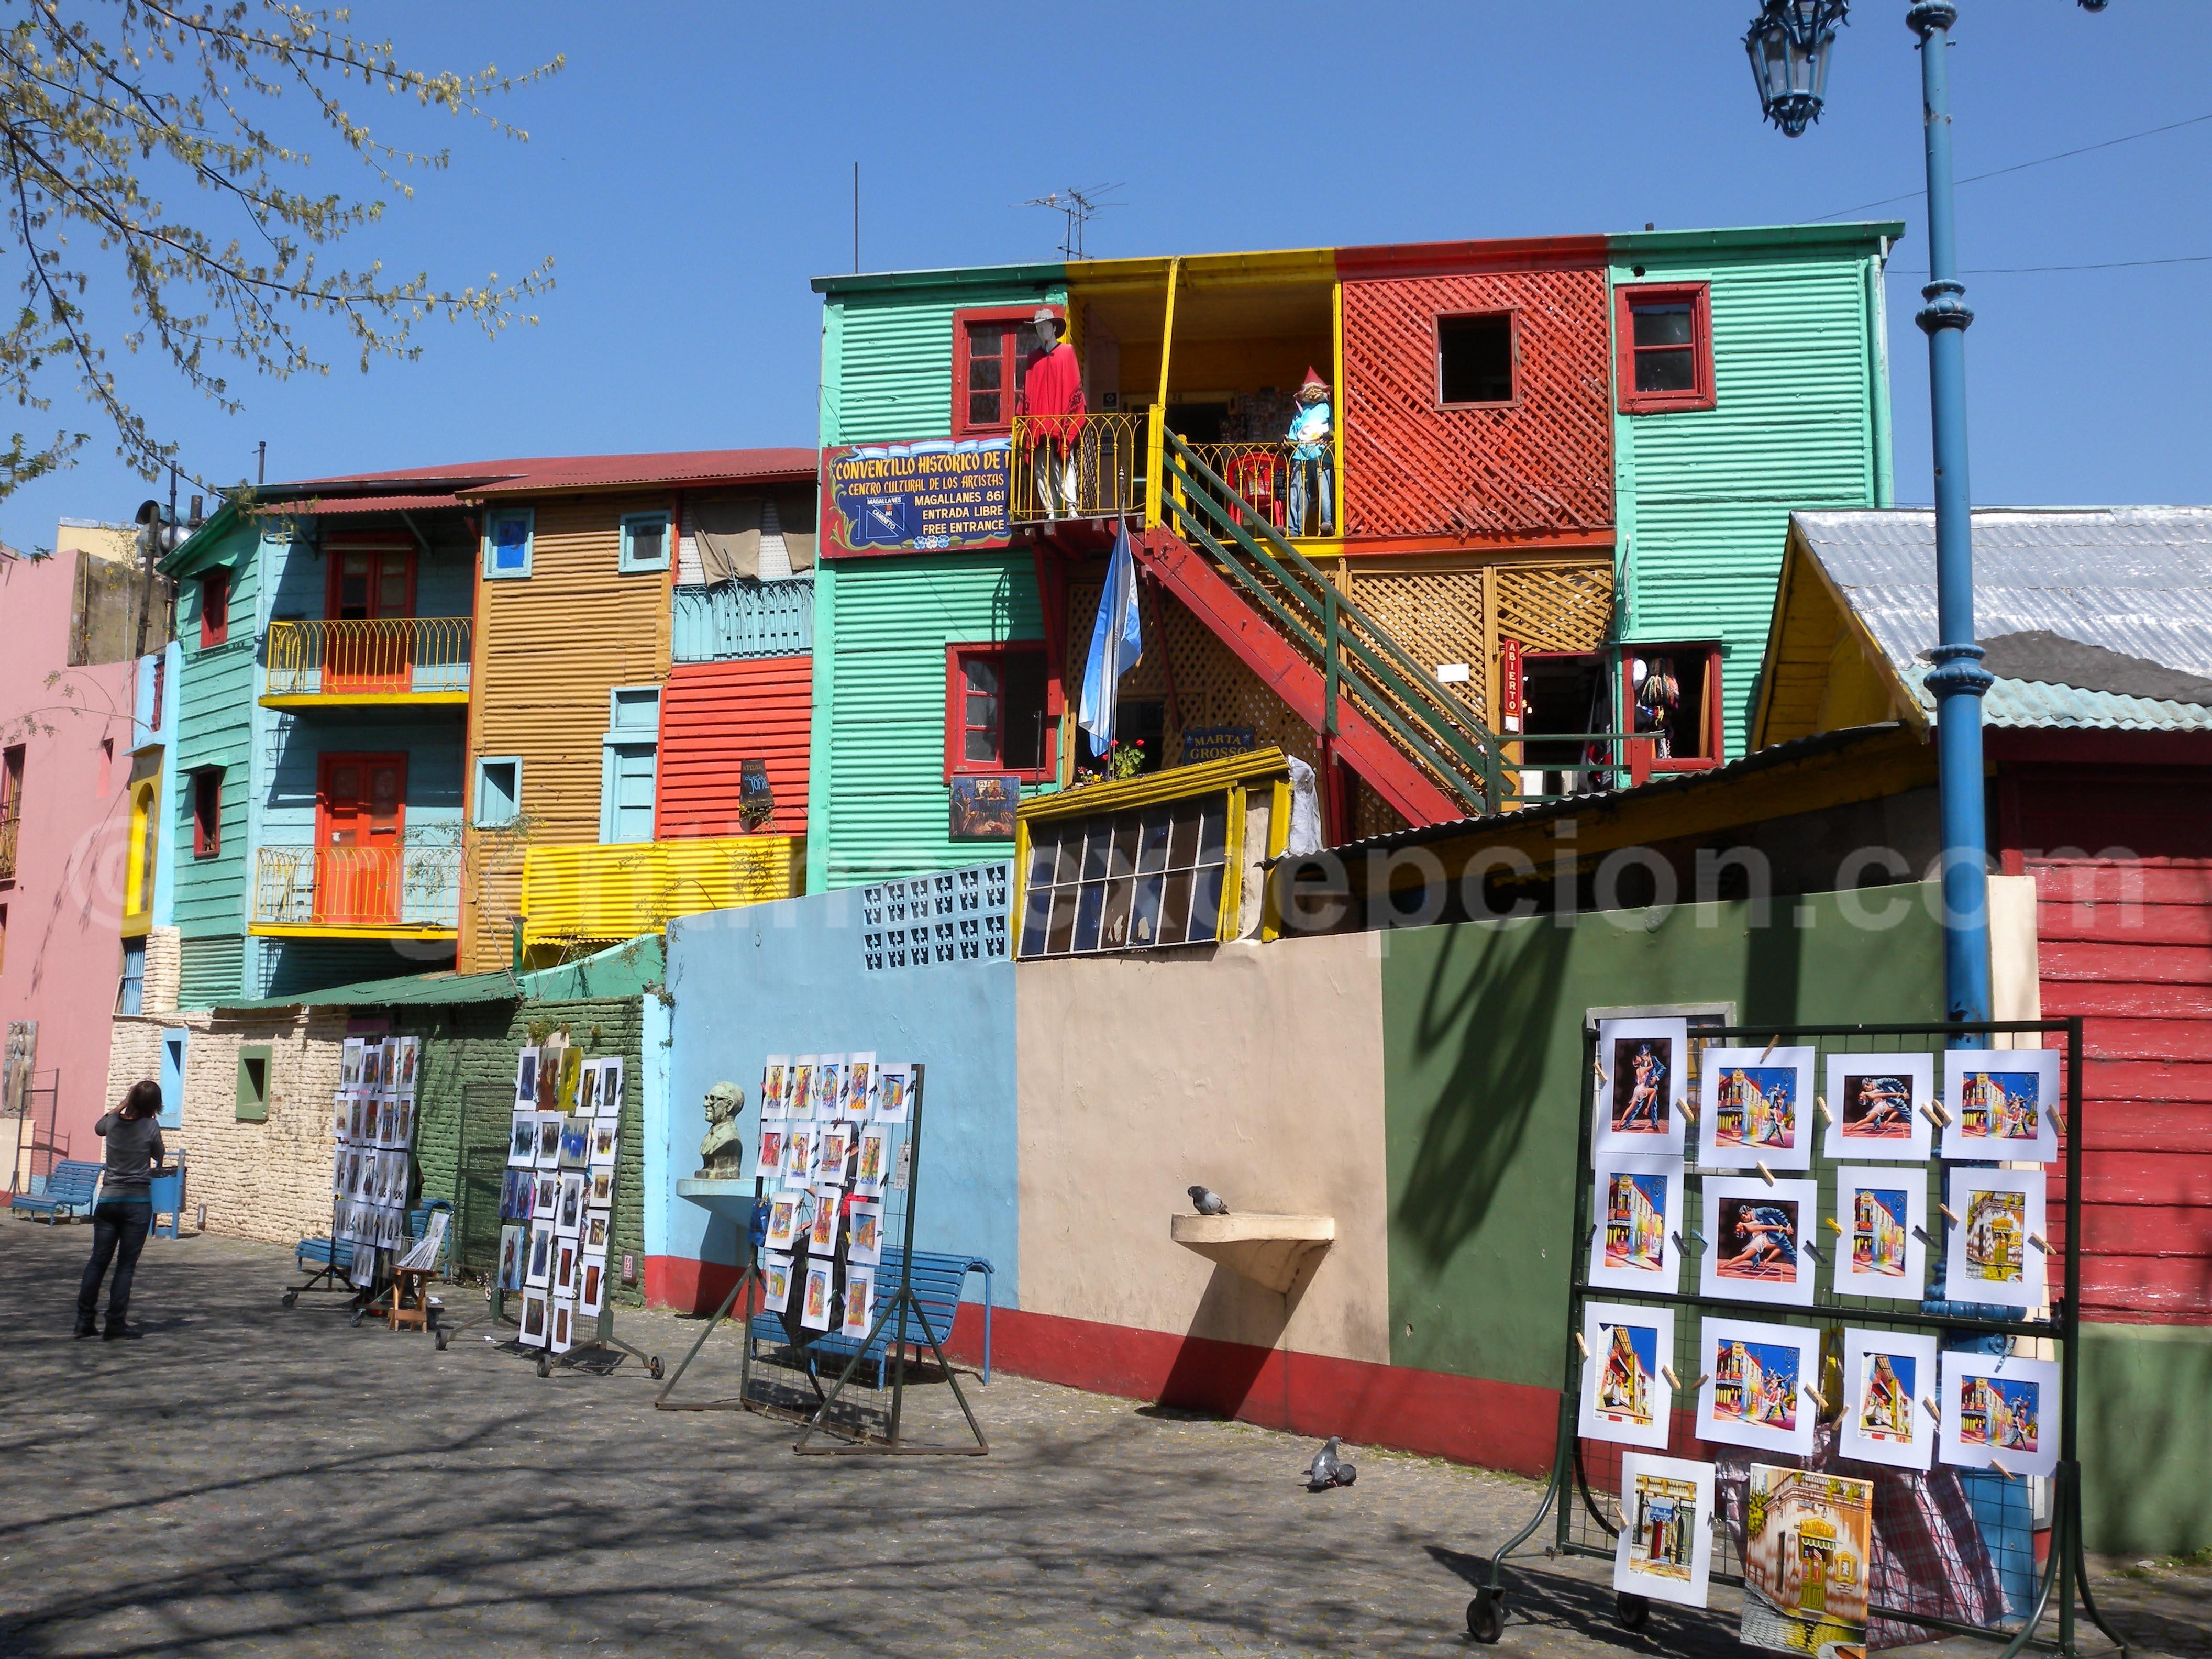 Voyager en Argentine : mode d'emploi